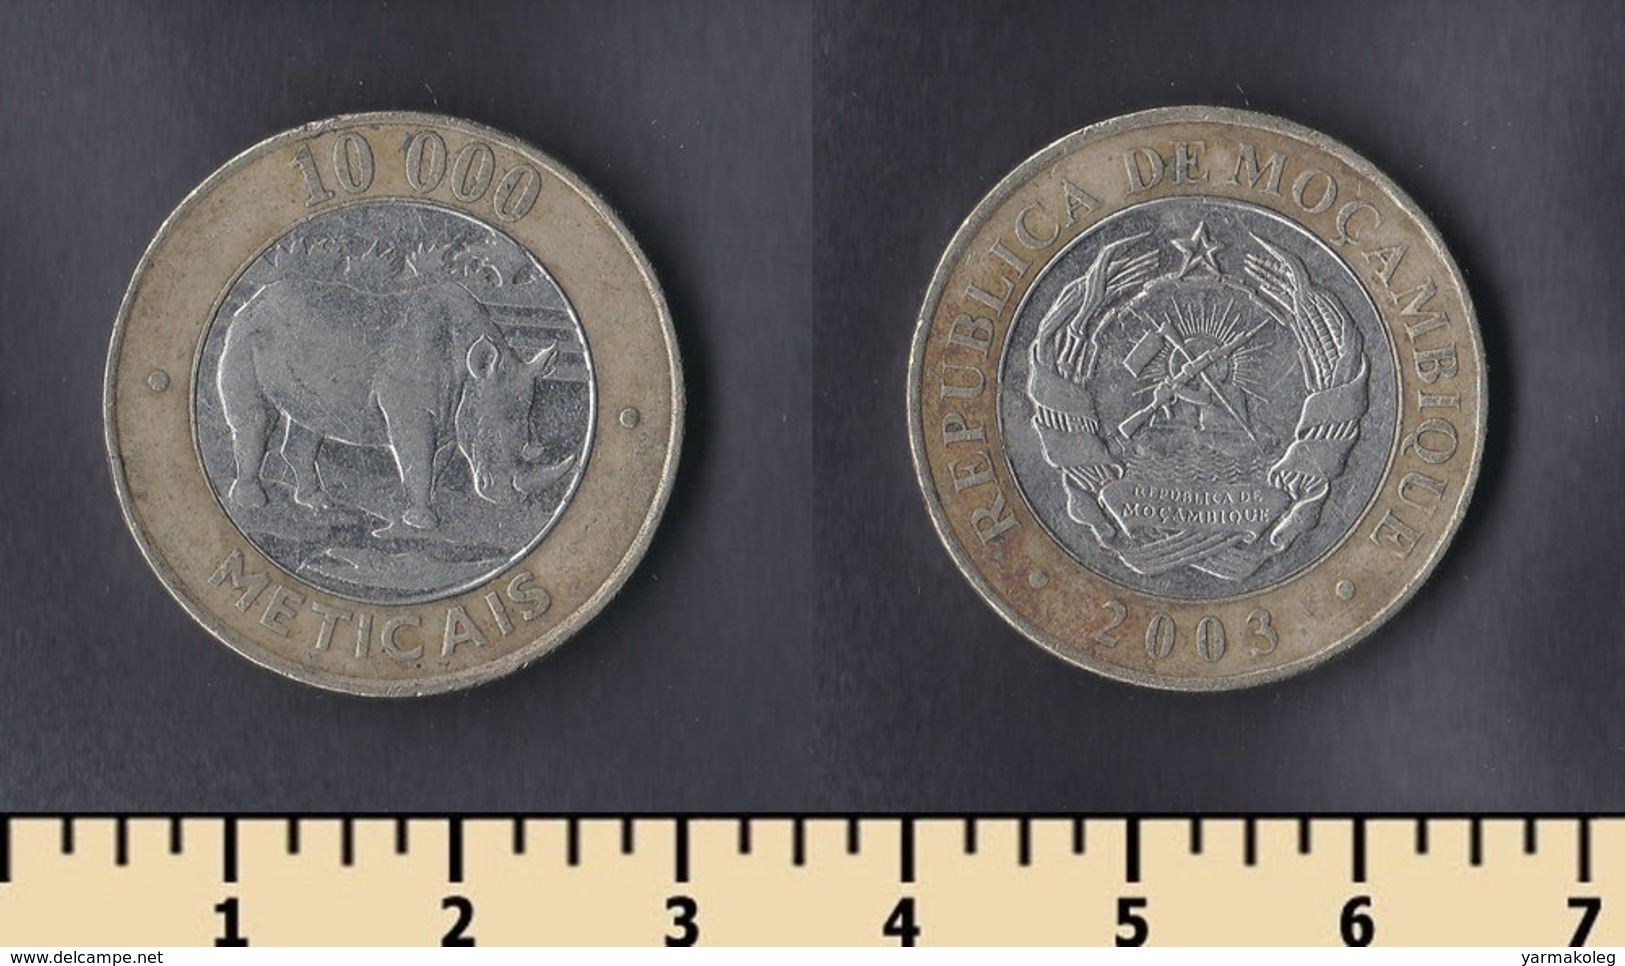 Mozambique 10000 Meticais 2003 - Mozambique